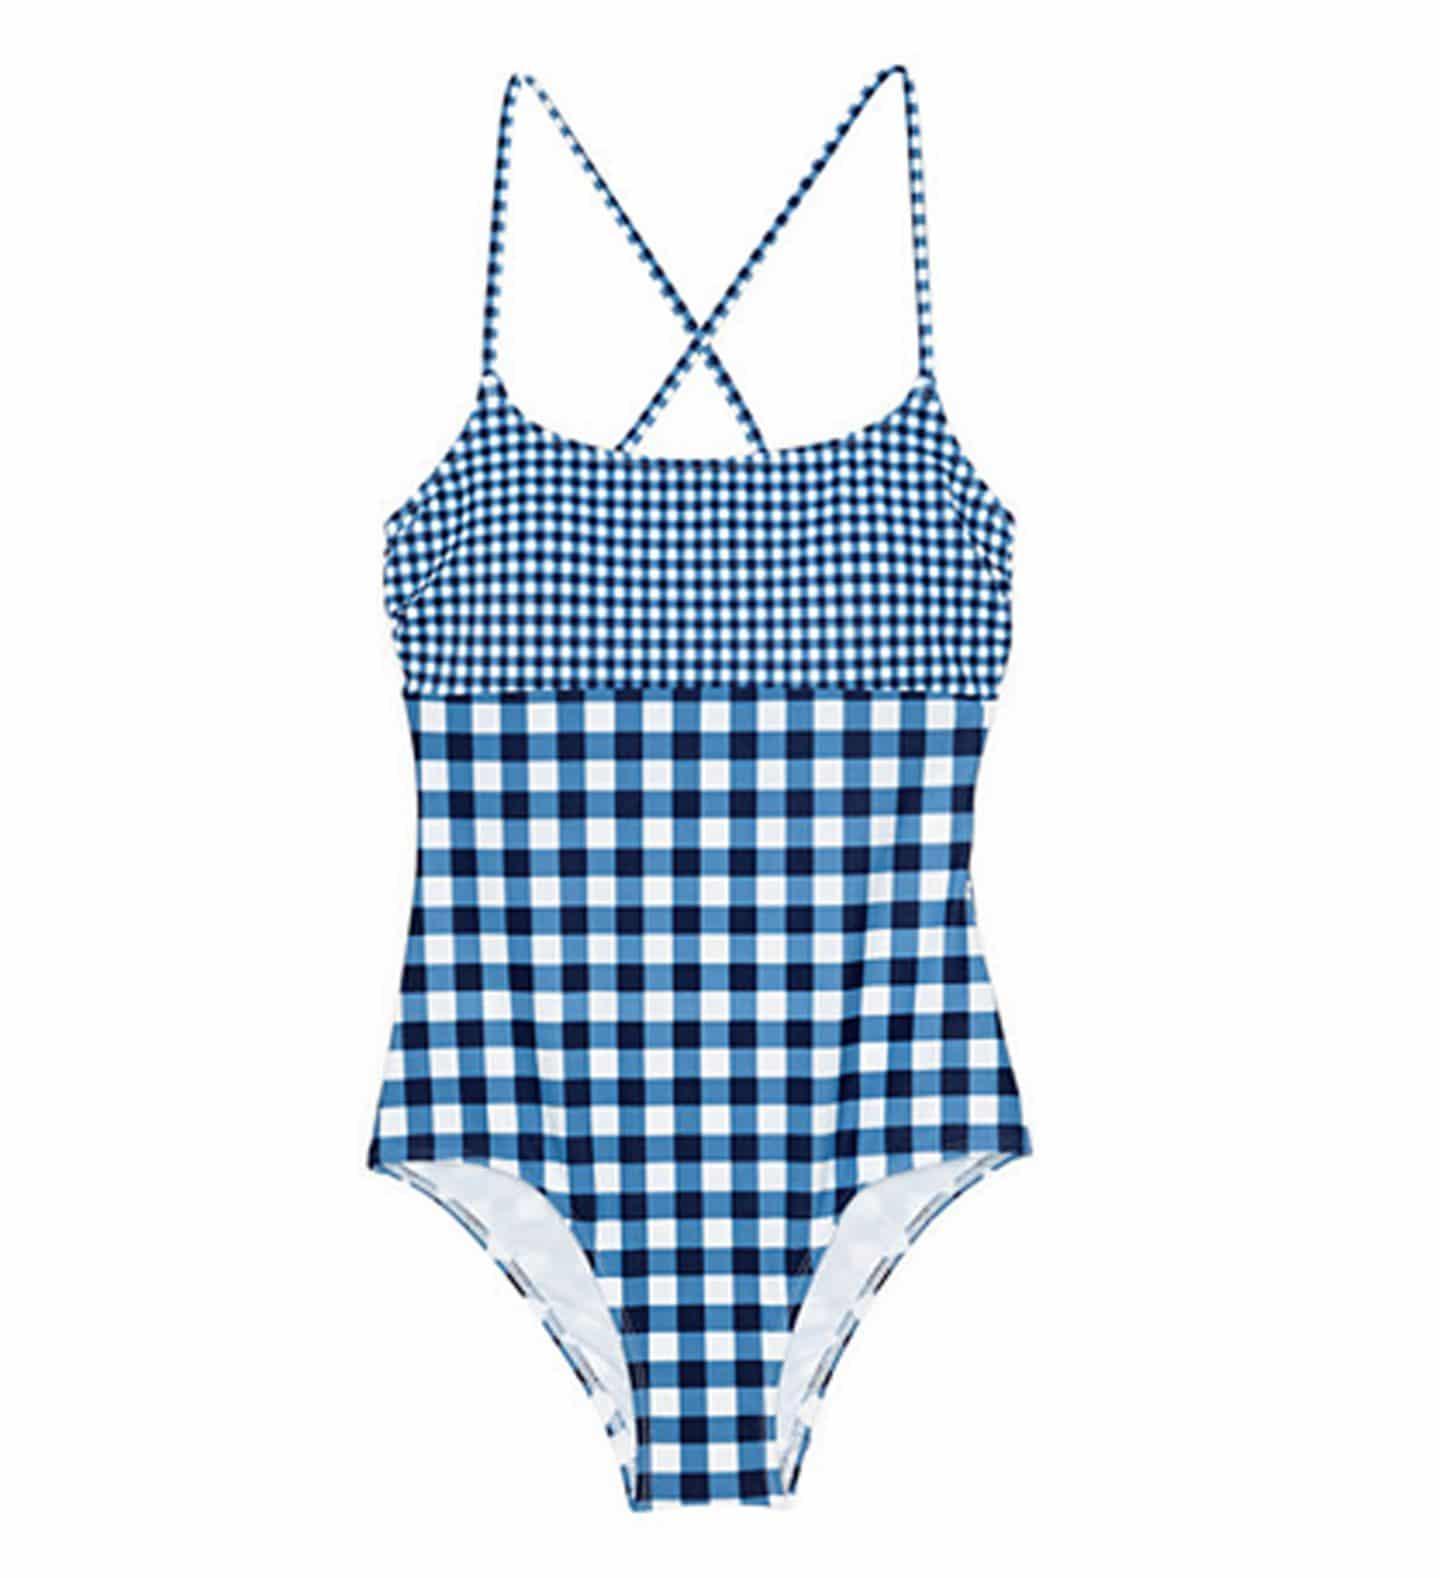 gingham one piece swimsuit | www.ashleybrookedesigns.com